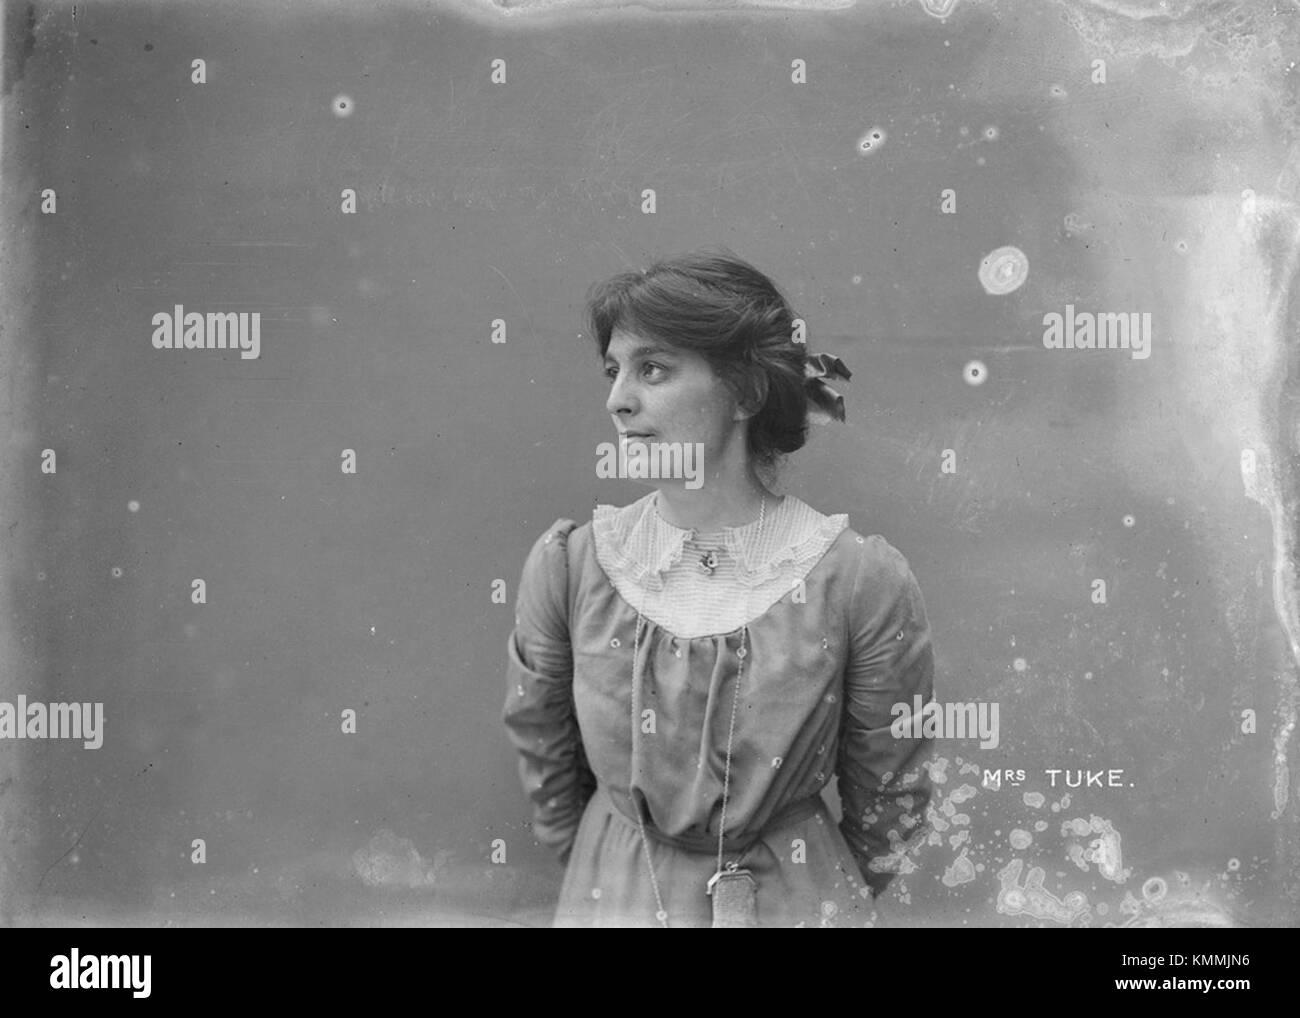 Mabel Tuke 1909 unattributed by Museum of London - Stock Image